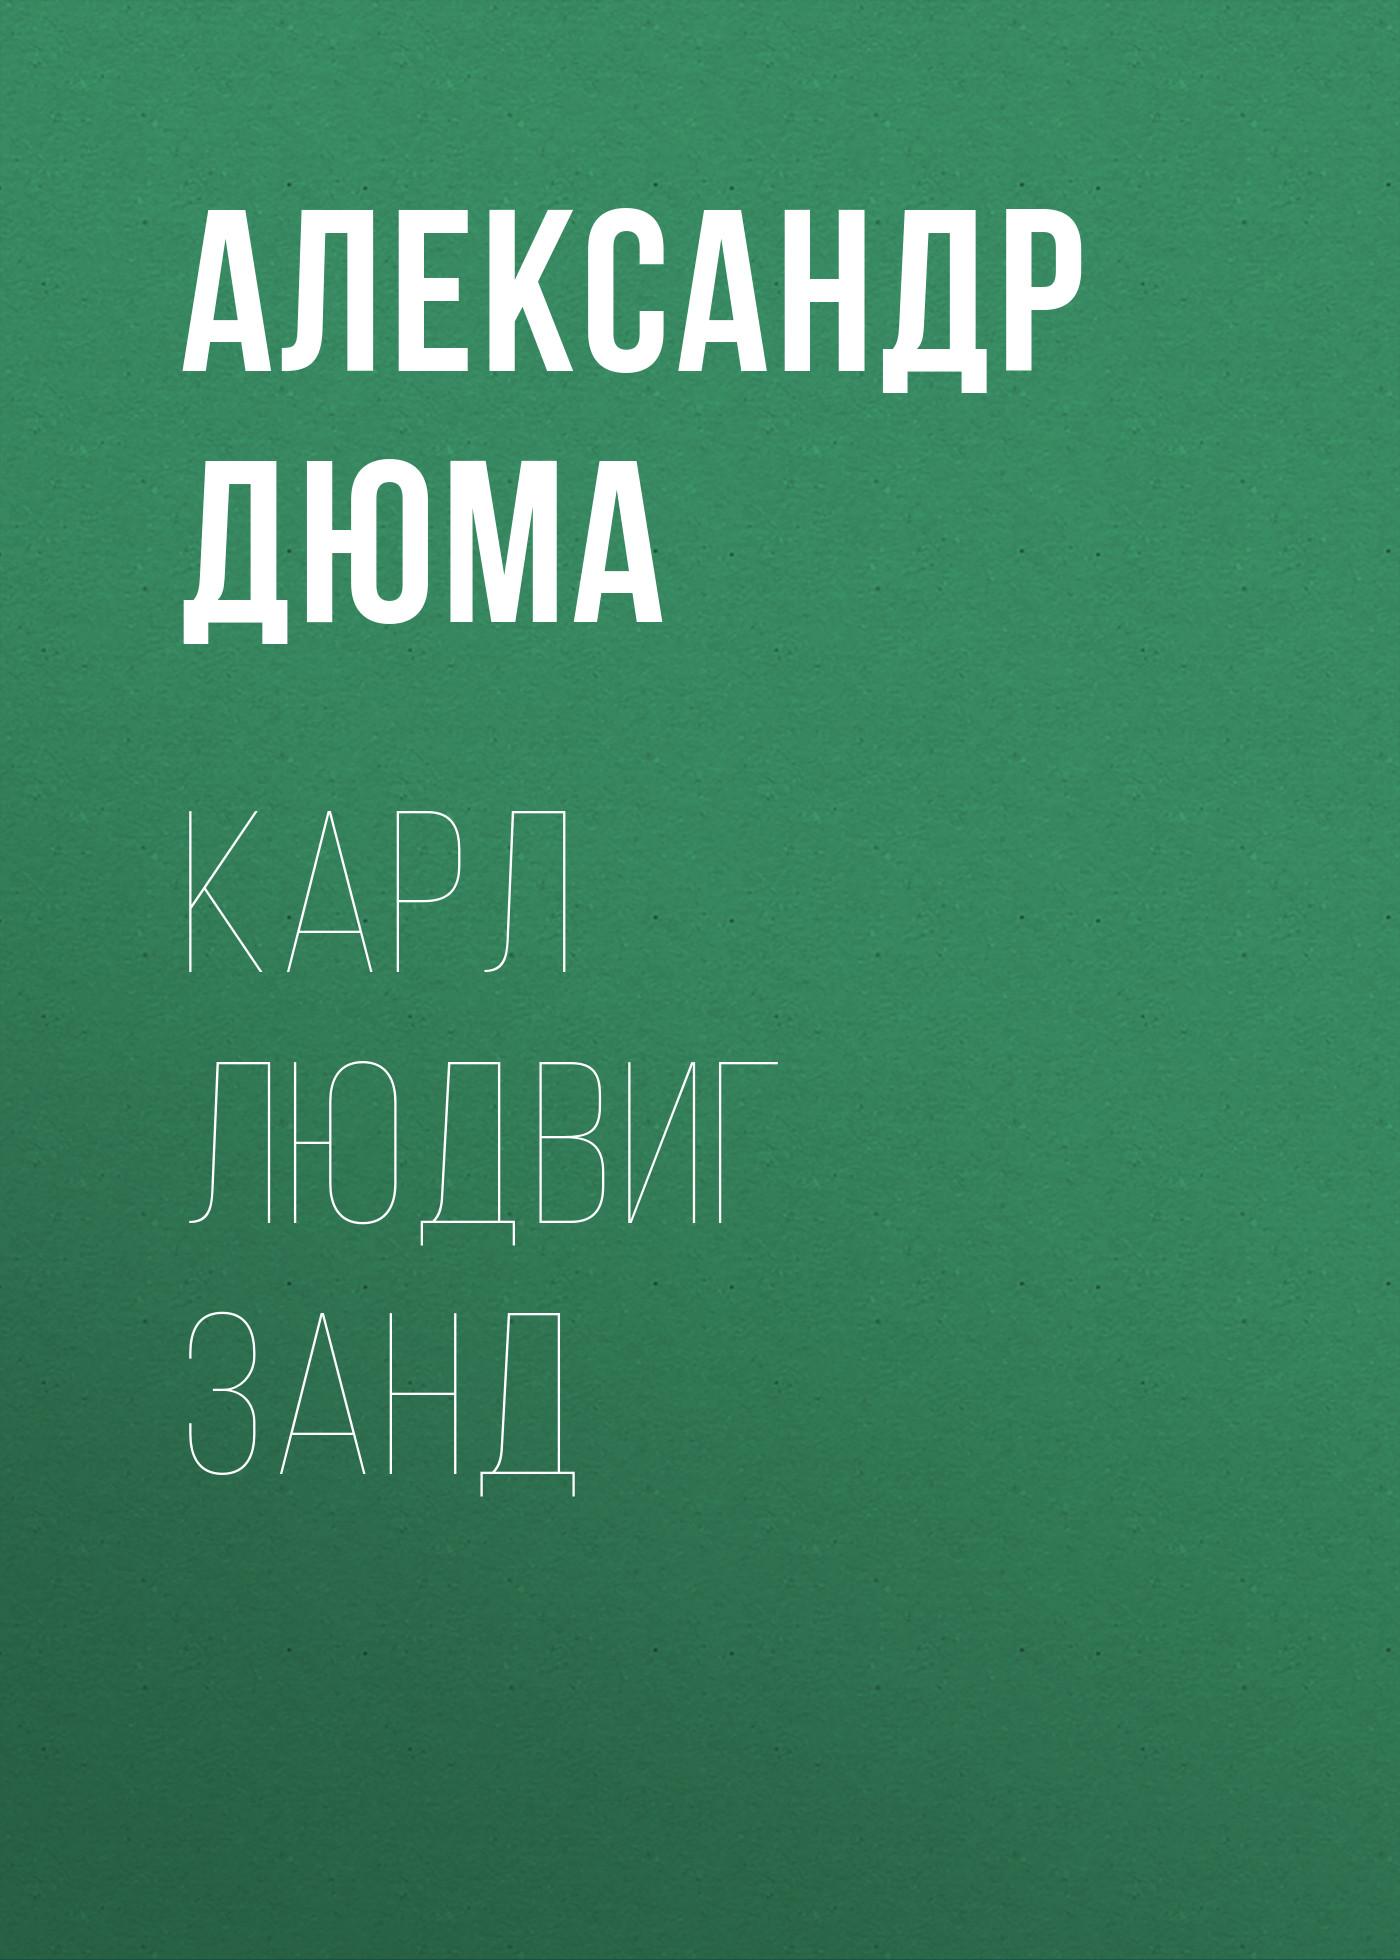 Купить книгу Карл Людвиг Занд, автора Александра Дюма